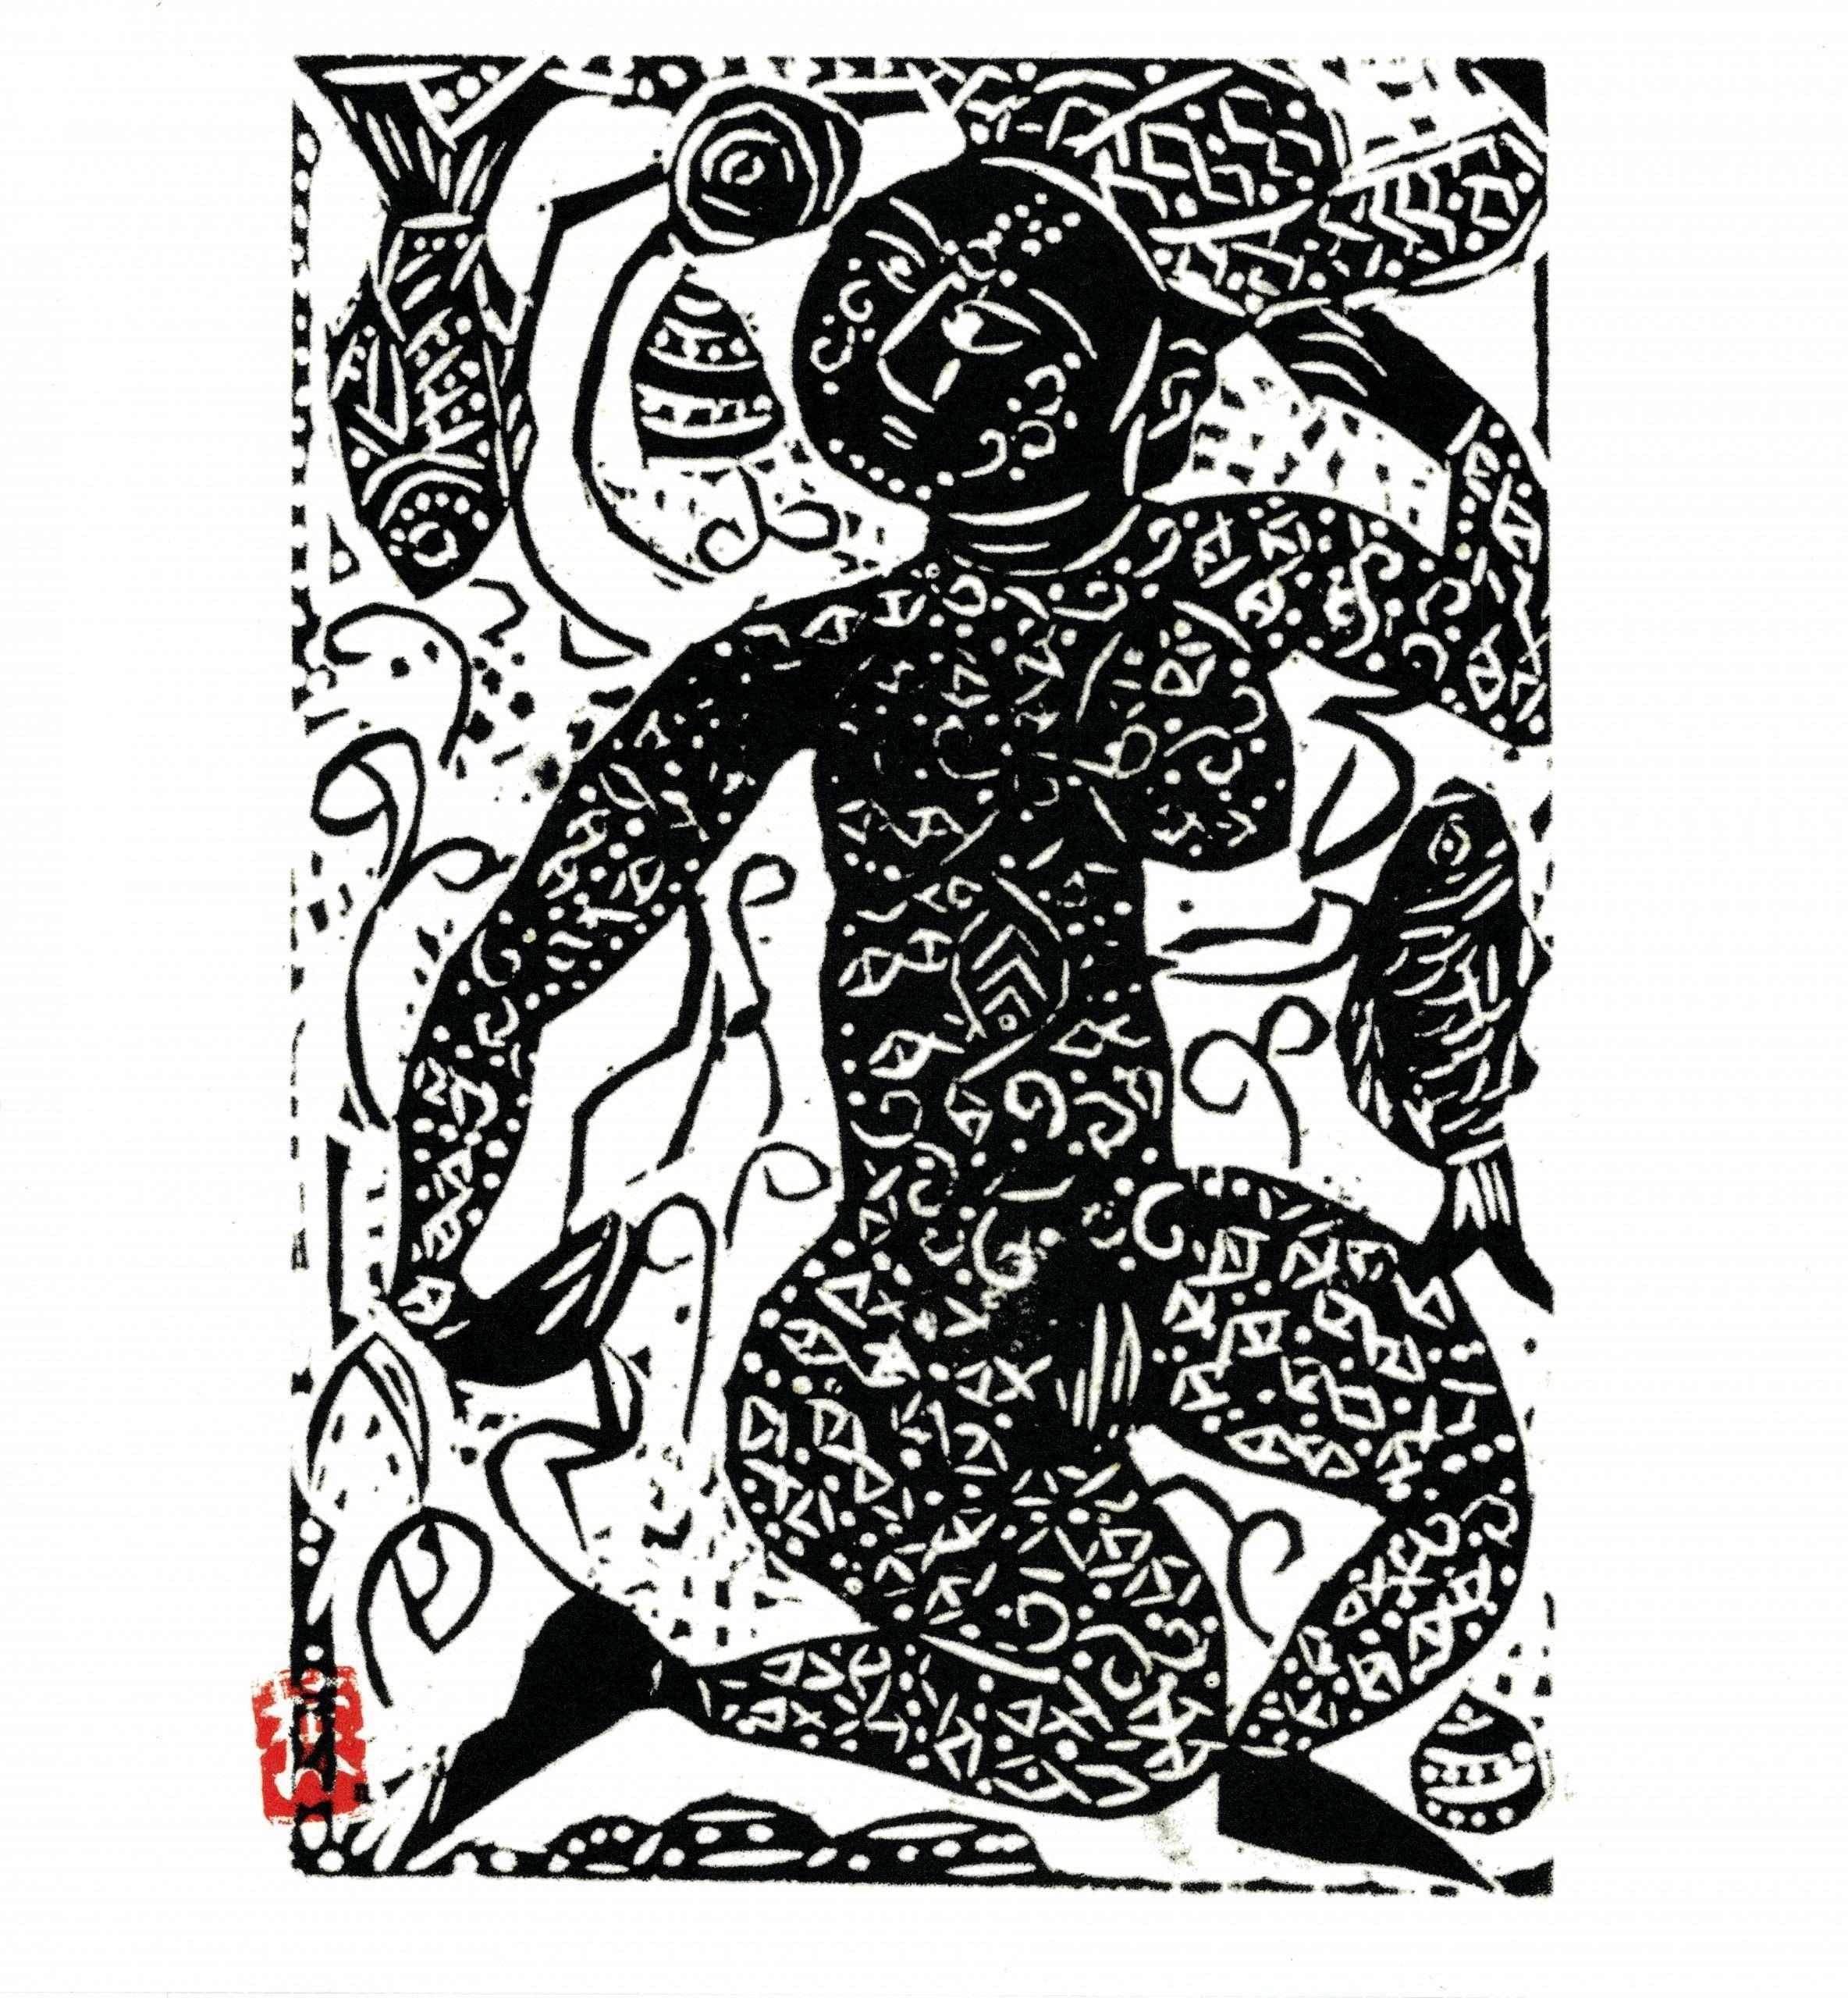 'Gyomonhi no saku (angels(A))'-edited